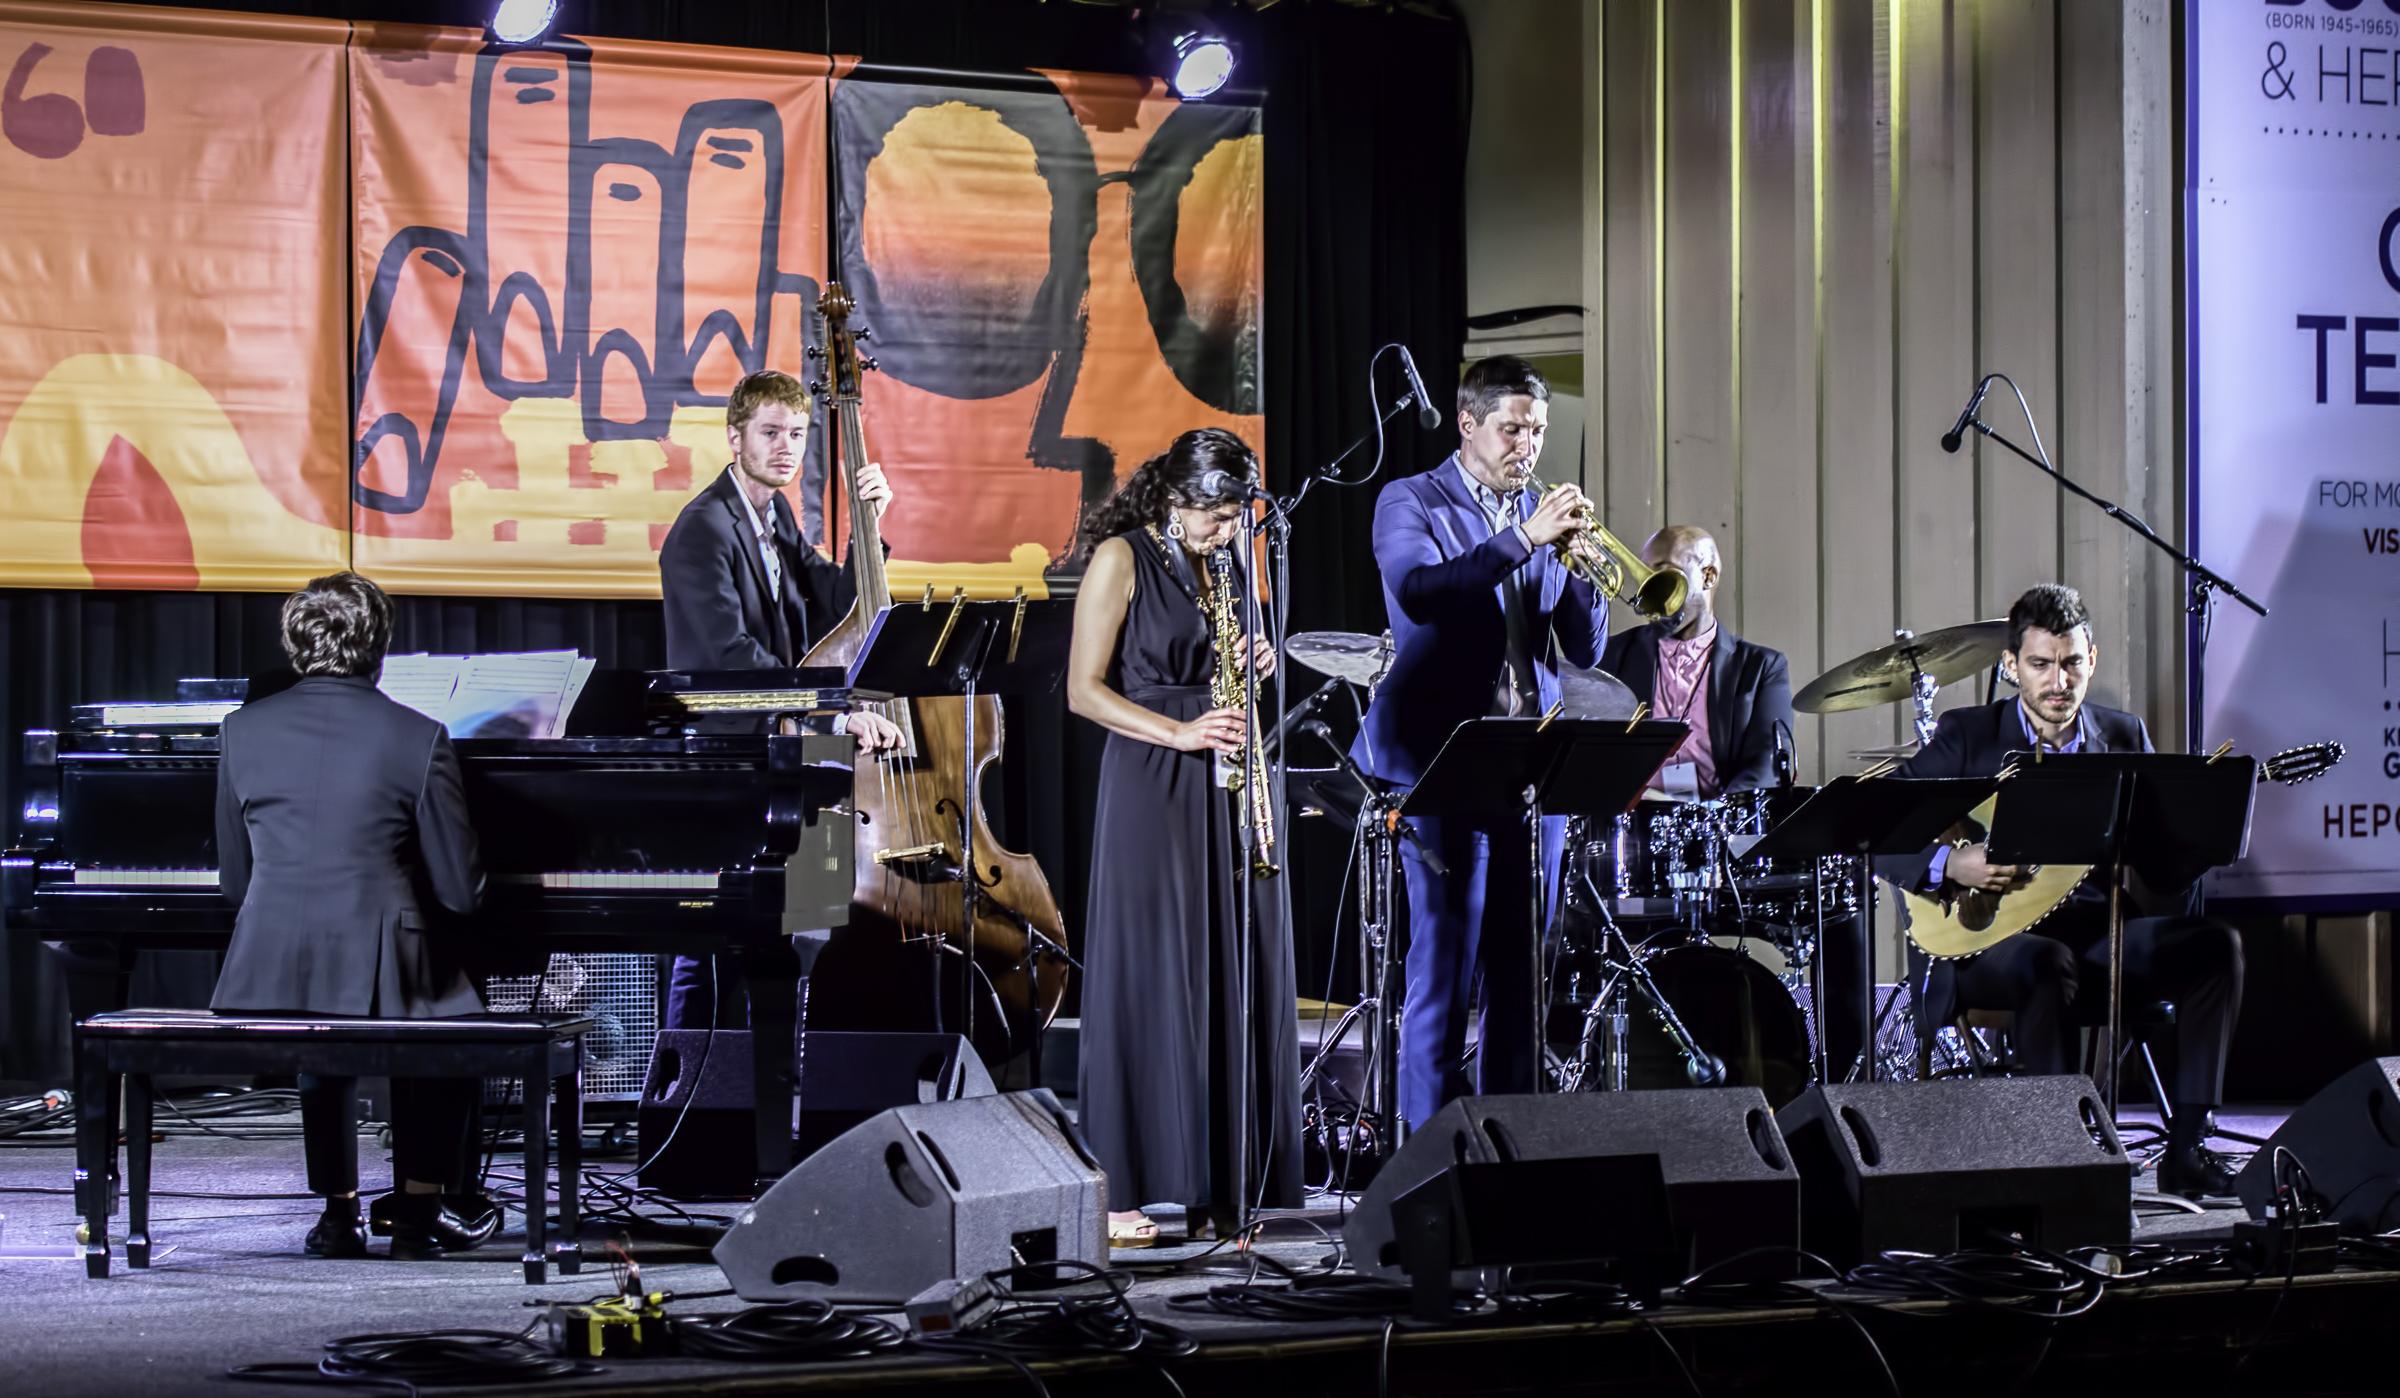 Chase Morrin, Jared Henderson Lihi Haruvi, Andrew McAnsh, Nathaniel Winn and Vasilis Kostas with the Berklee Global Jazz Ambassadors at the Monterey Jazz Festival